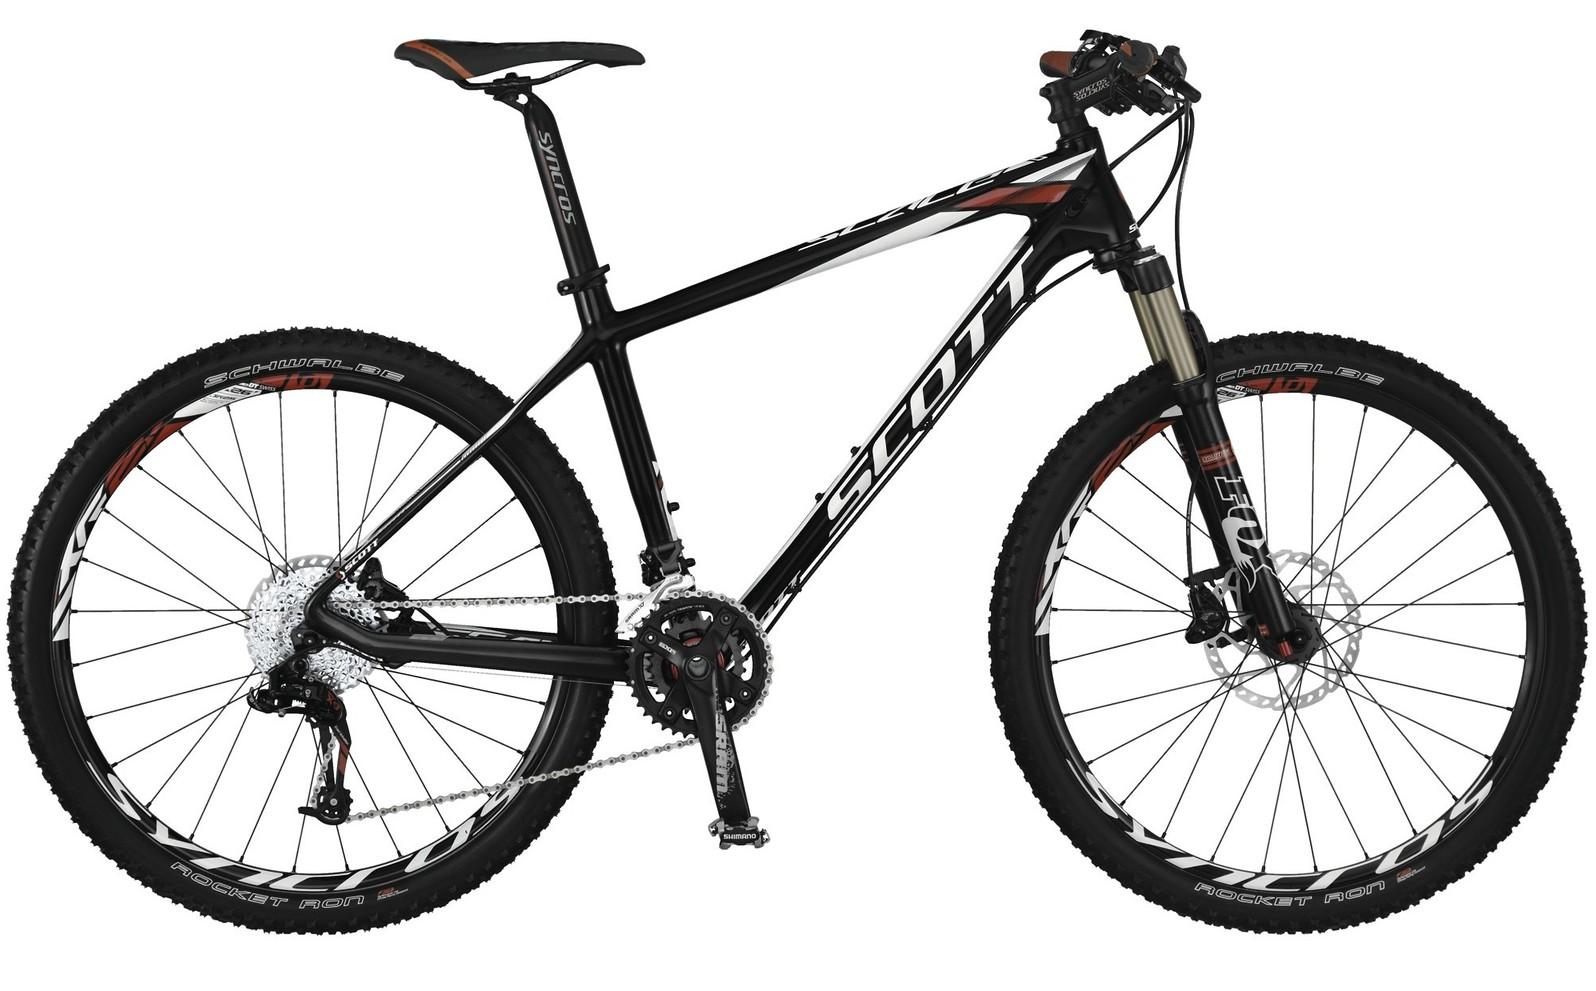 2013 Scott Scale 630 Bike bike - Scott Scale 630